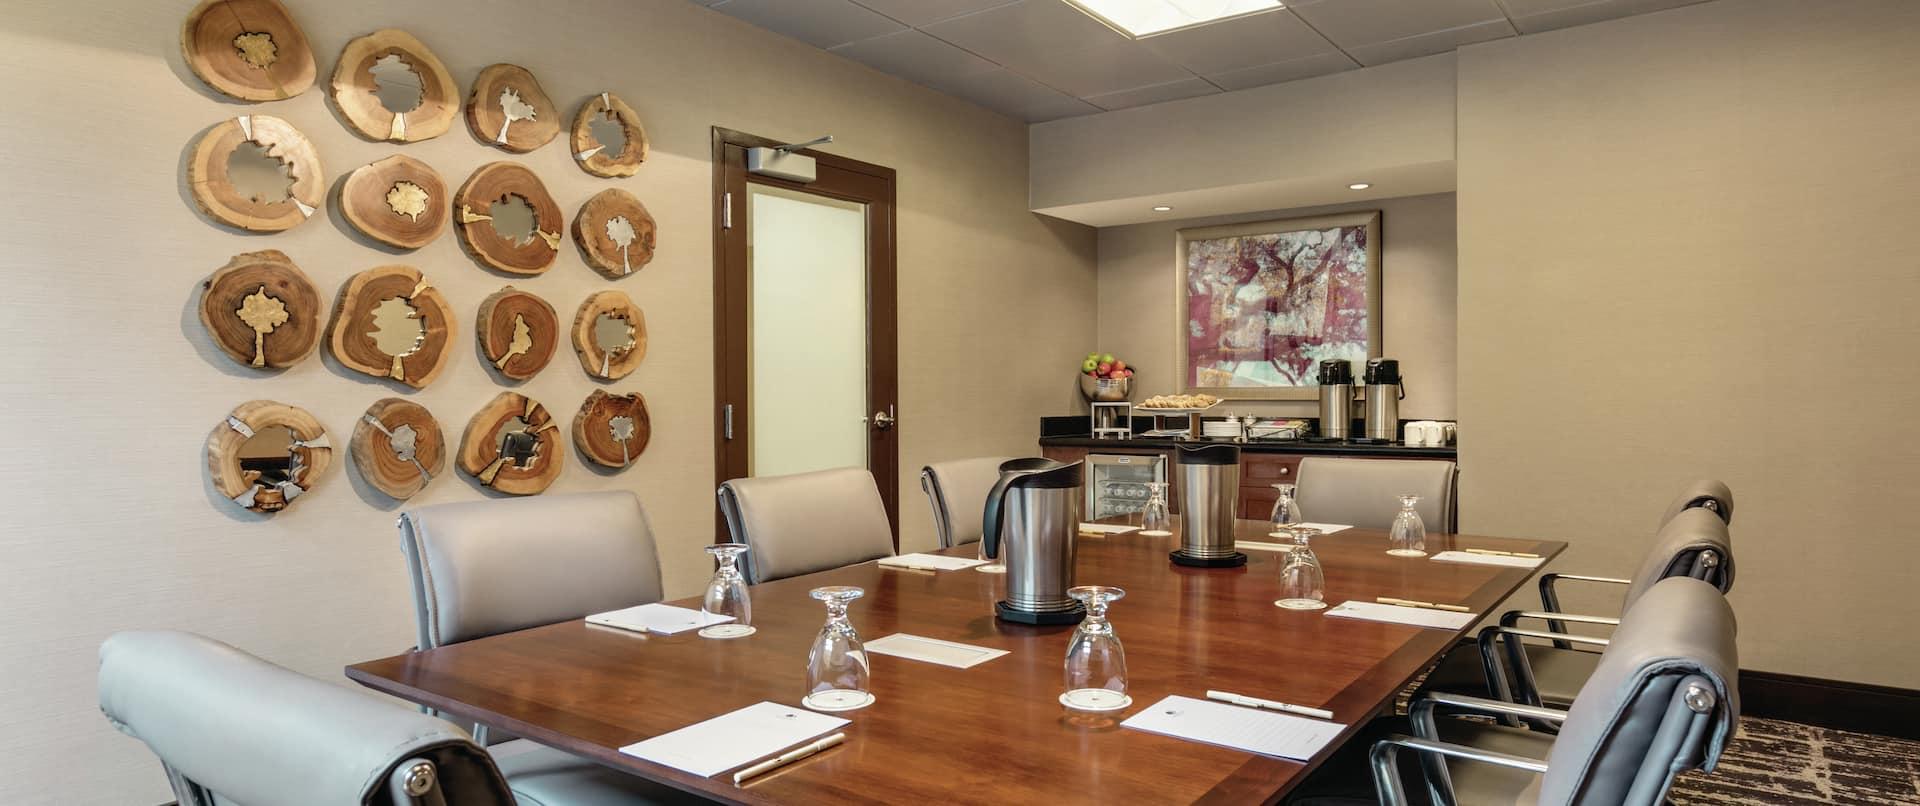 Boardroom With Beverage & Food Station